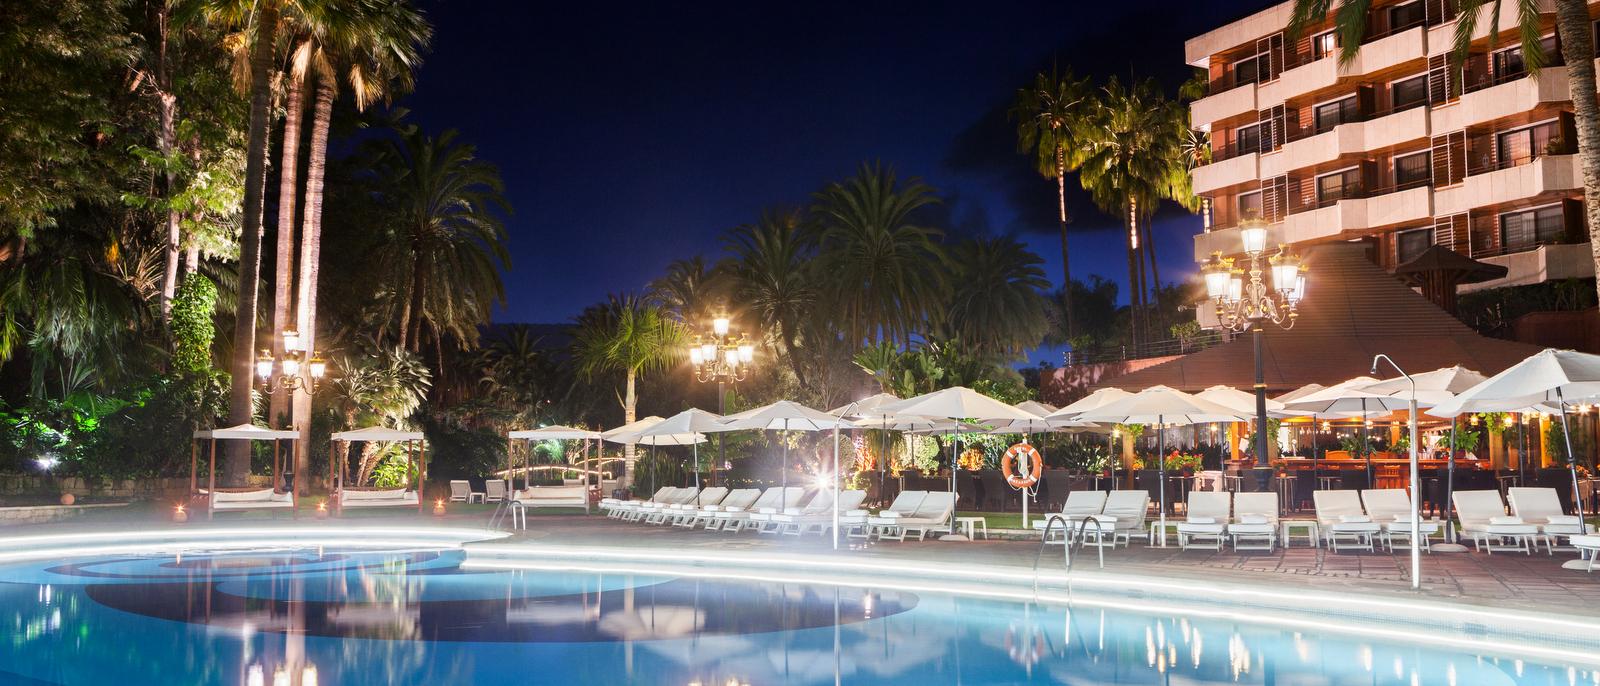 hotel-botanico-main-pool-night